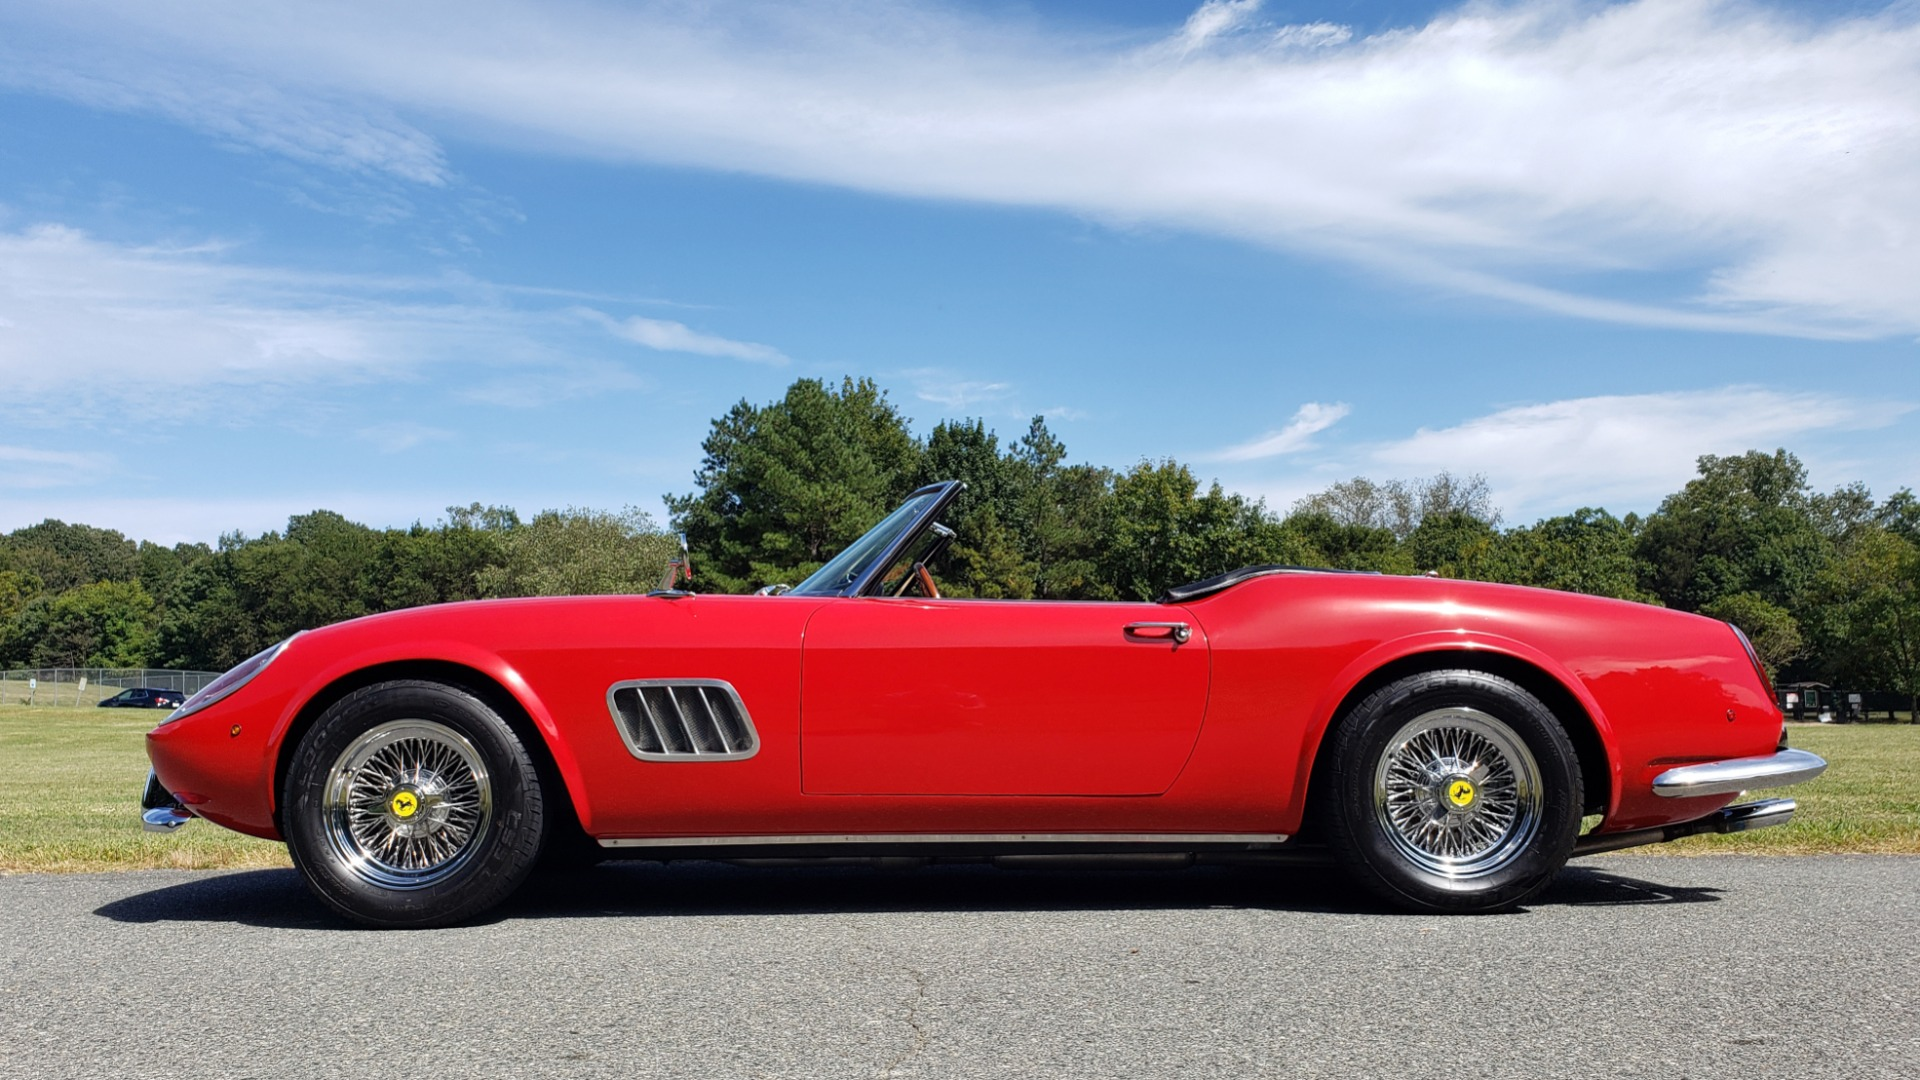 Used 1961 Ferrari 250GT SWB CALIFORNIA REPLICA / 302CI V8 / TREMEC 5-SPEED for sale Sold at Formula Imports in Charlotte NC 28227 11